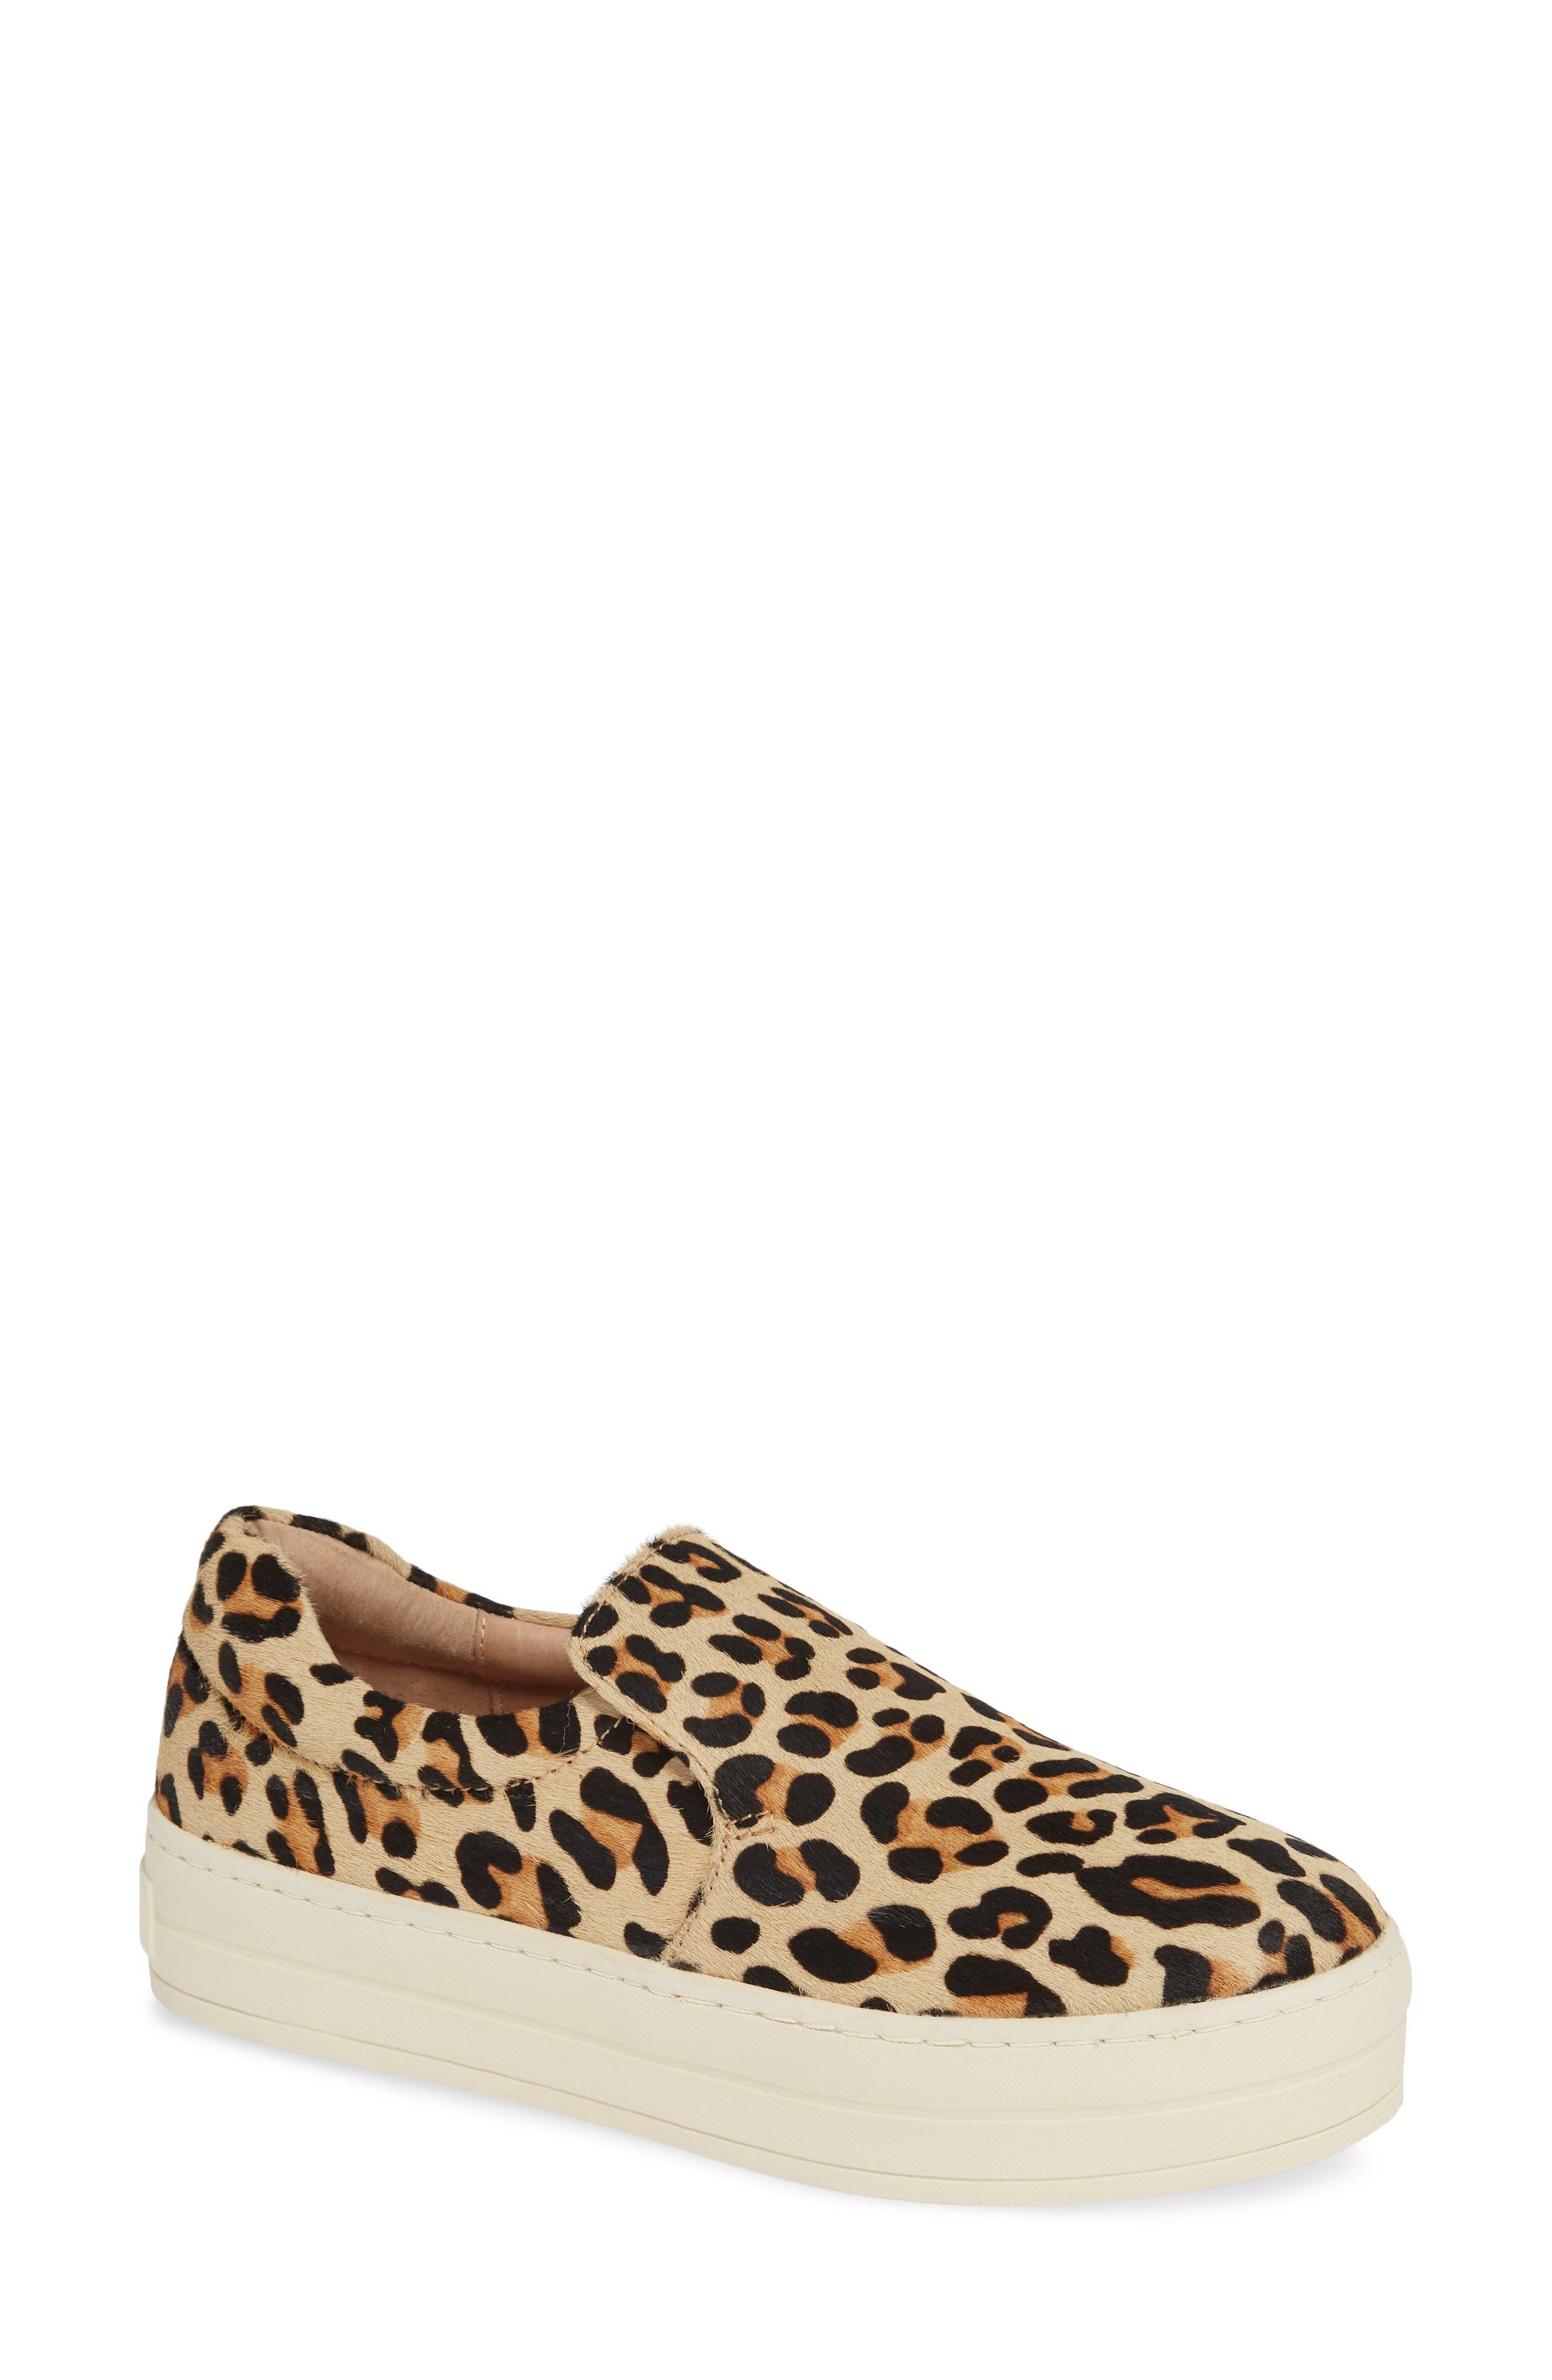 Harry Genuine Calf Hair Slip-On Sneaker in Leopard Calf Hair